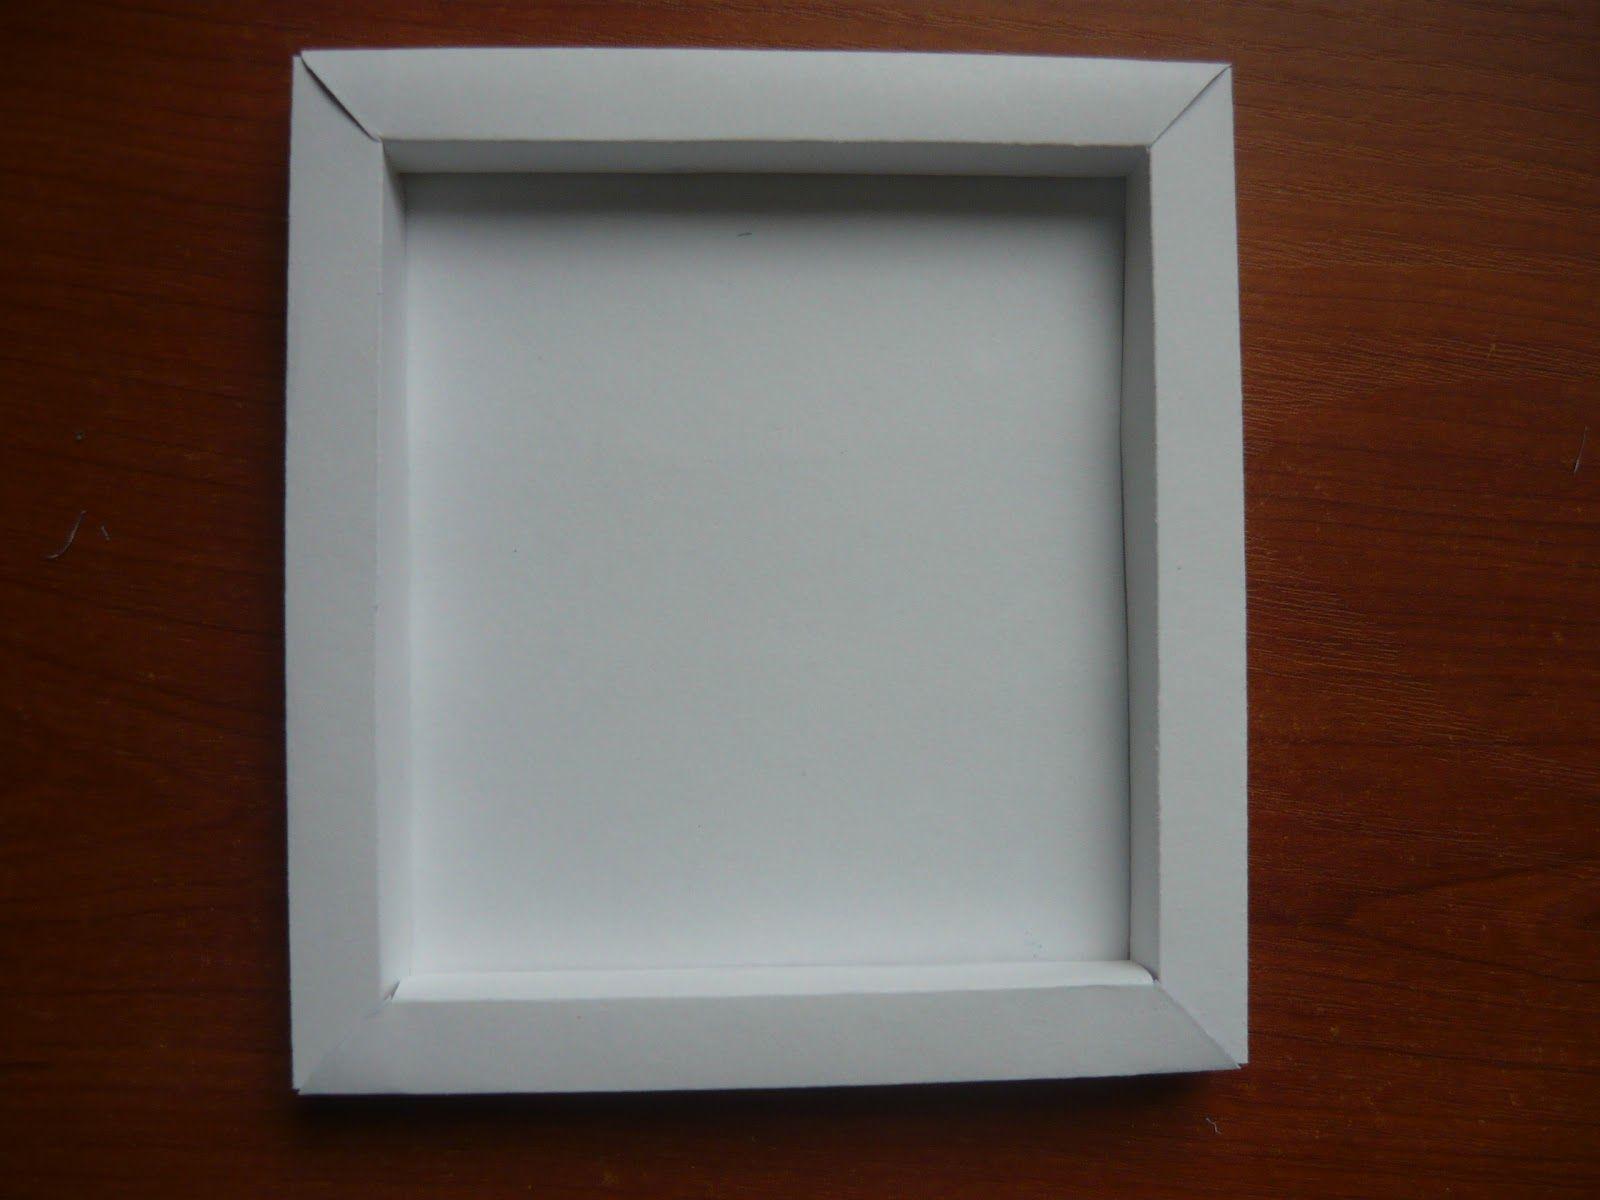 Рамка из ватмана для фото своими руками из